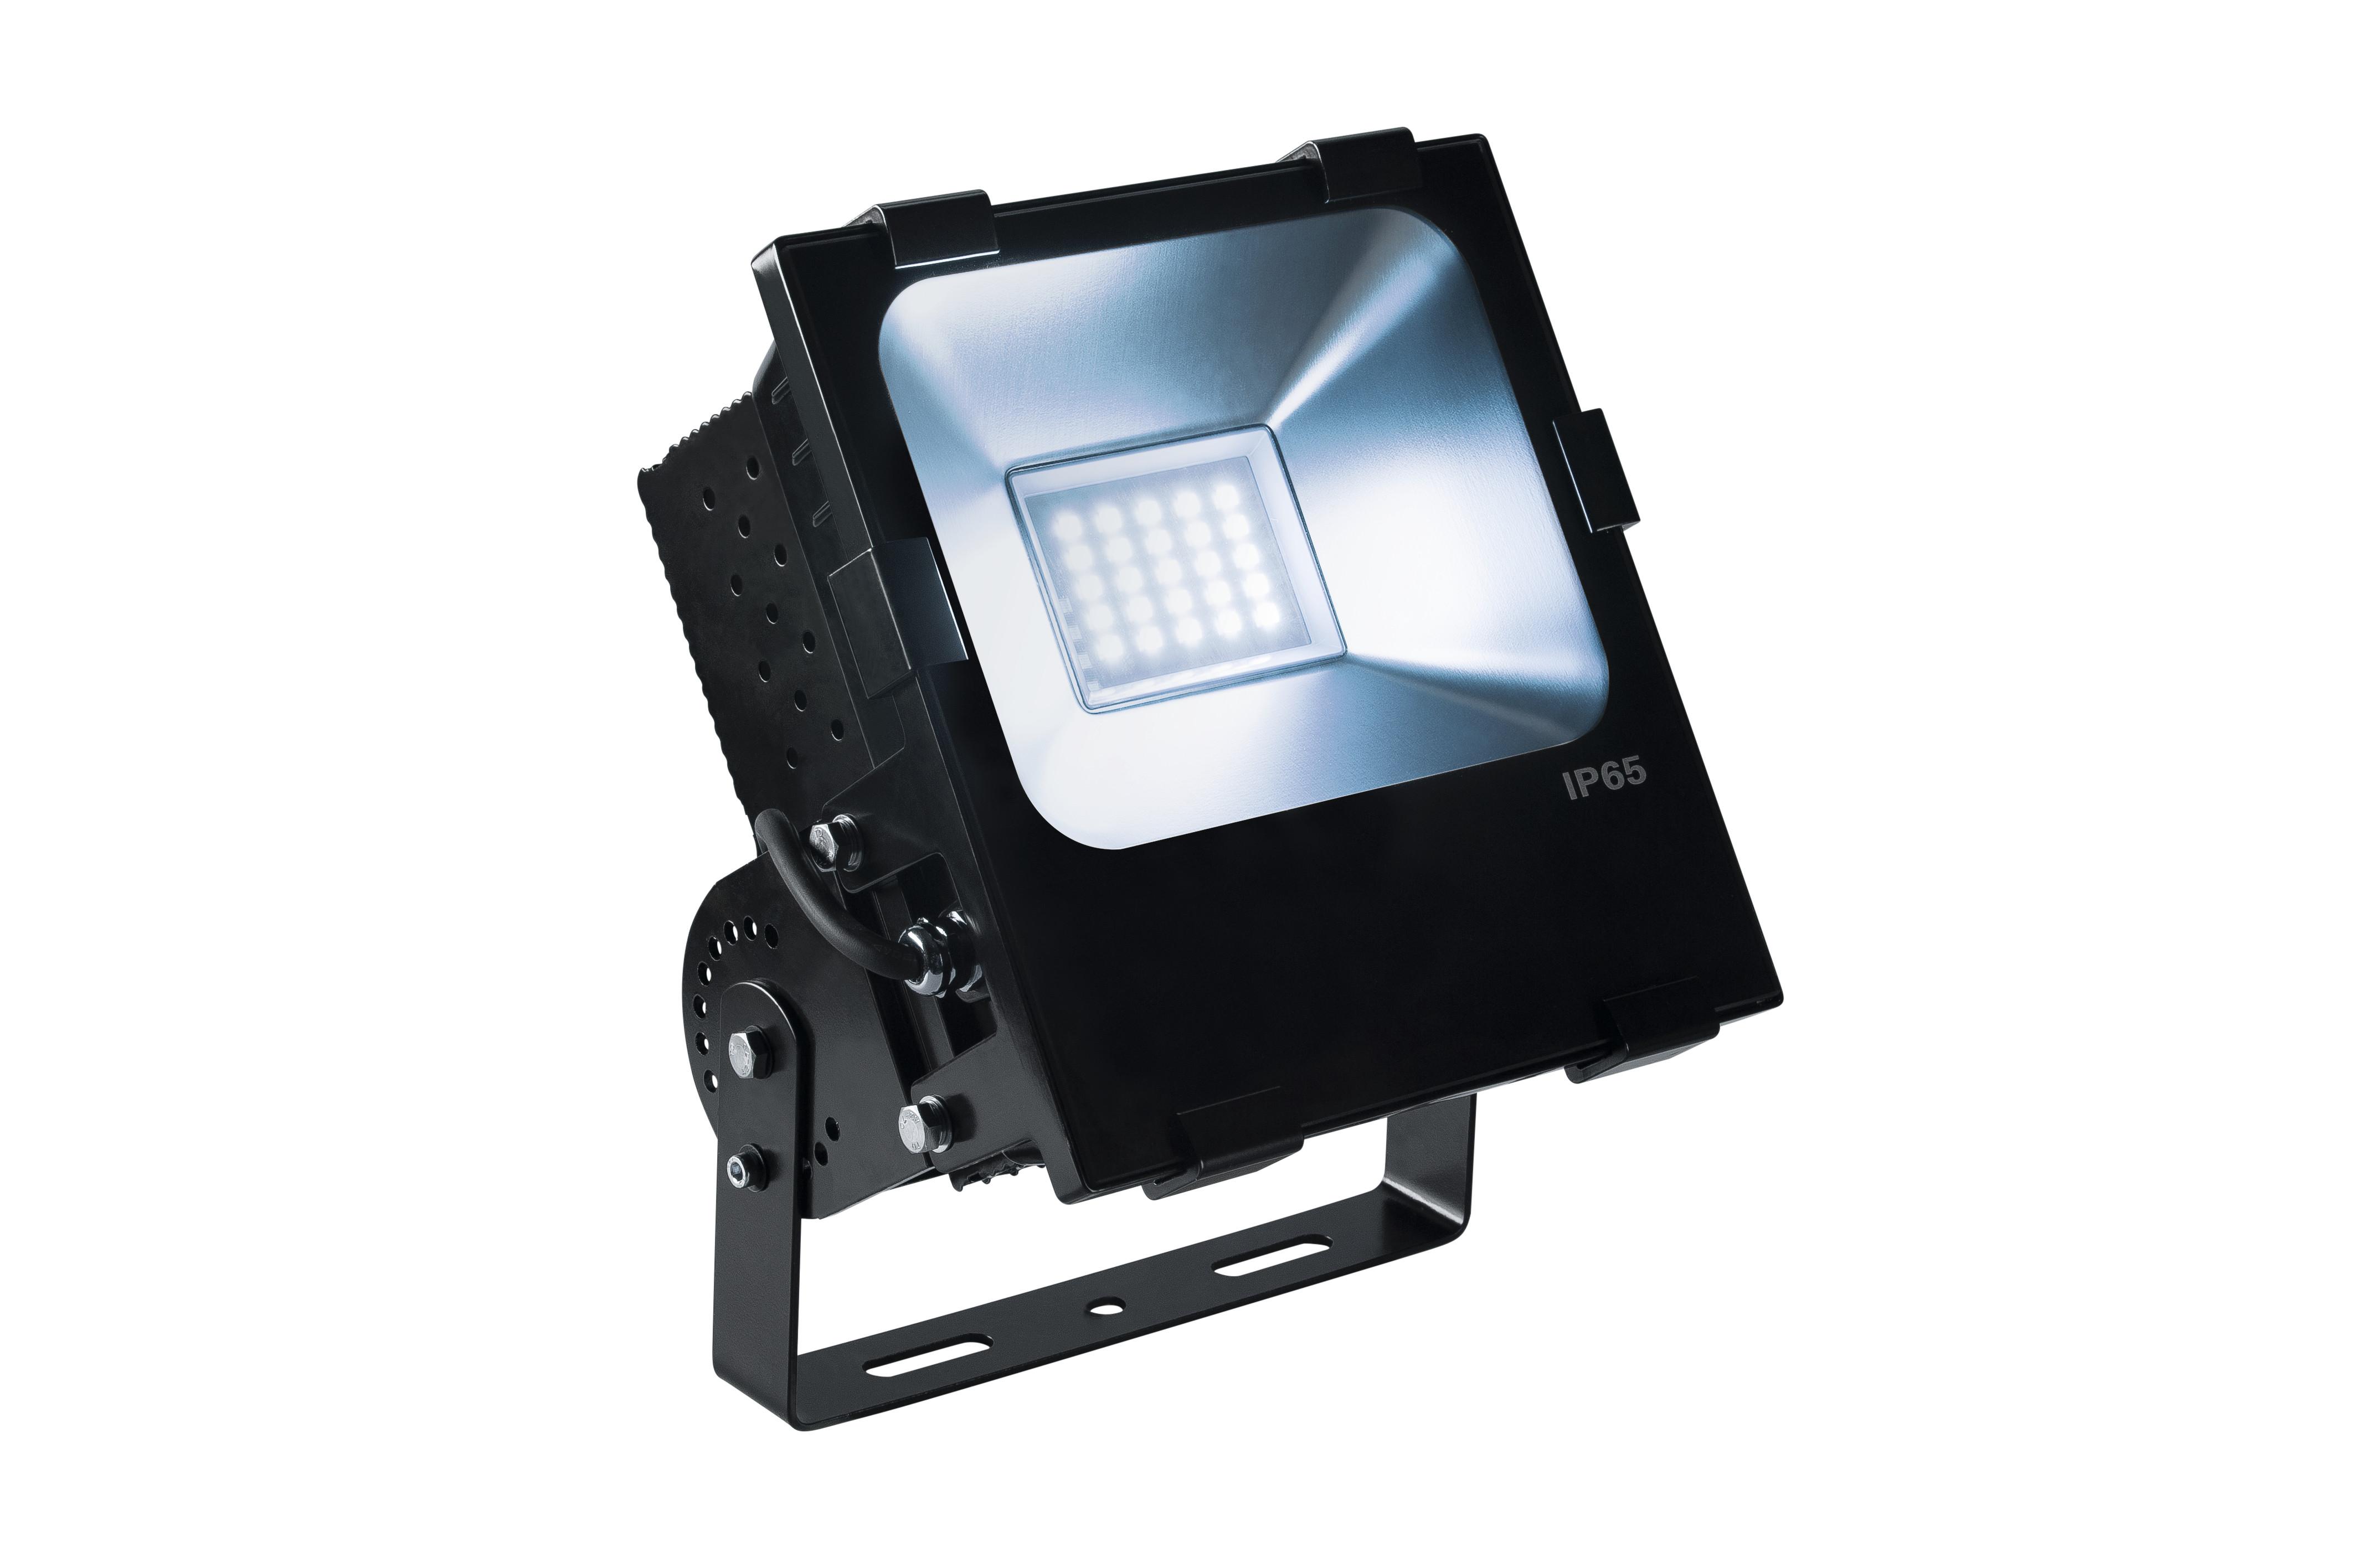 1 Stk DISOS, Outdoor Strahler, LED, 4000K, schwarz, 100W LI232380--